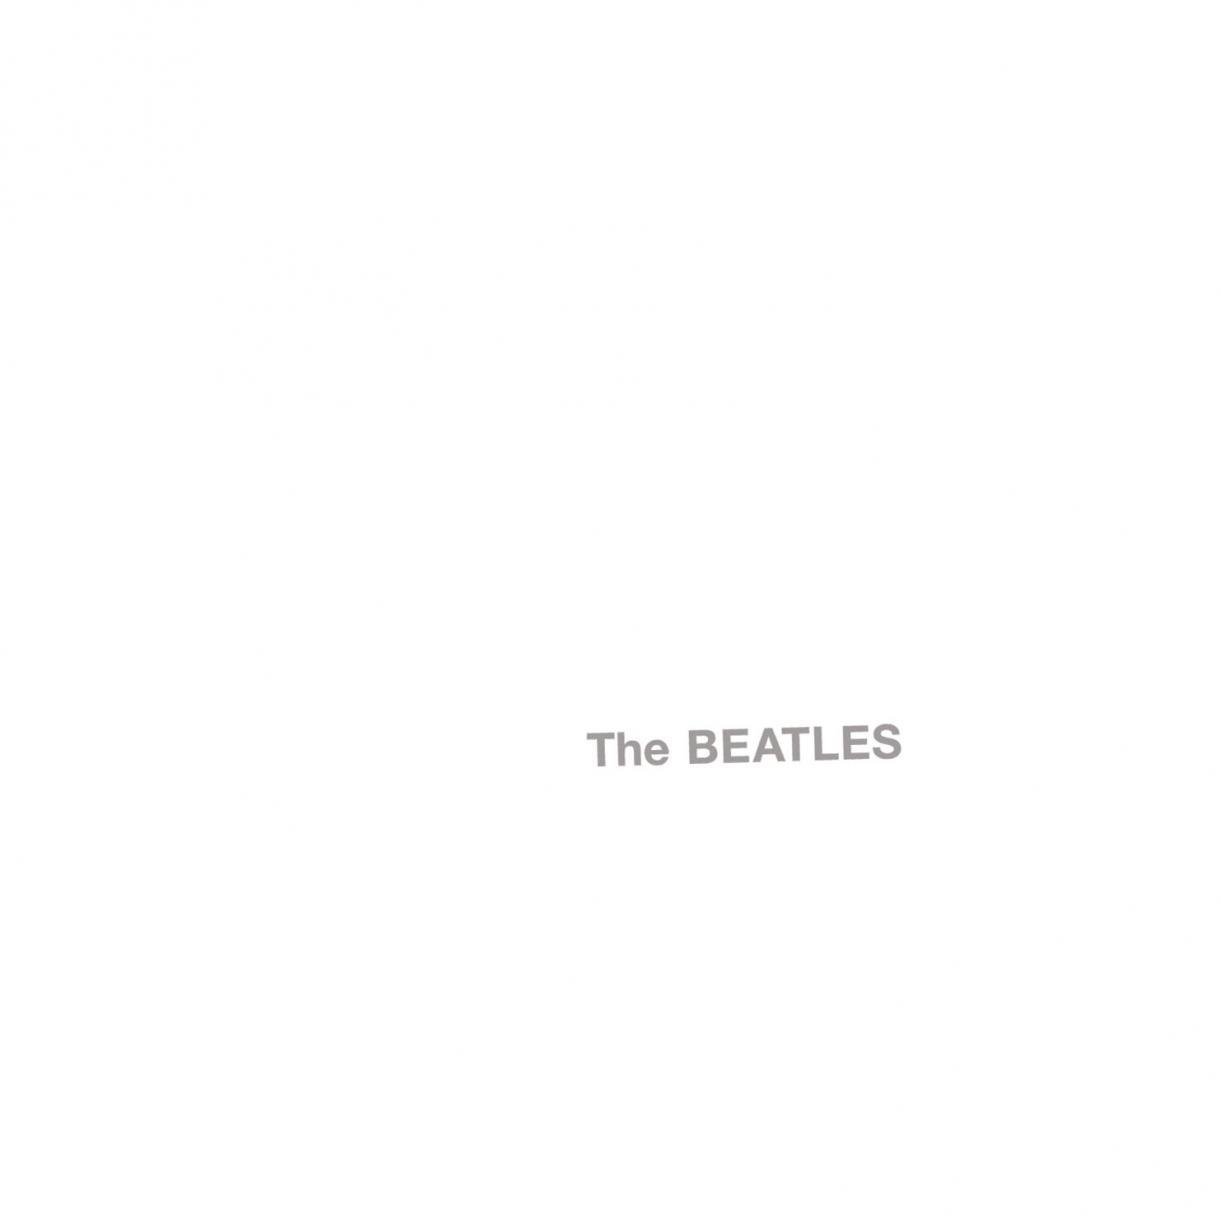 The Beatles | The Beatles (White Album) | EMI, 1968